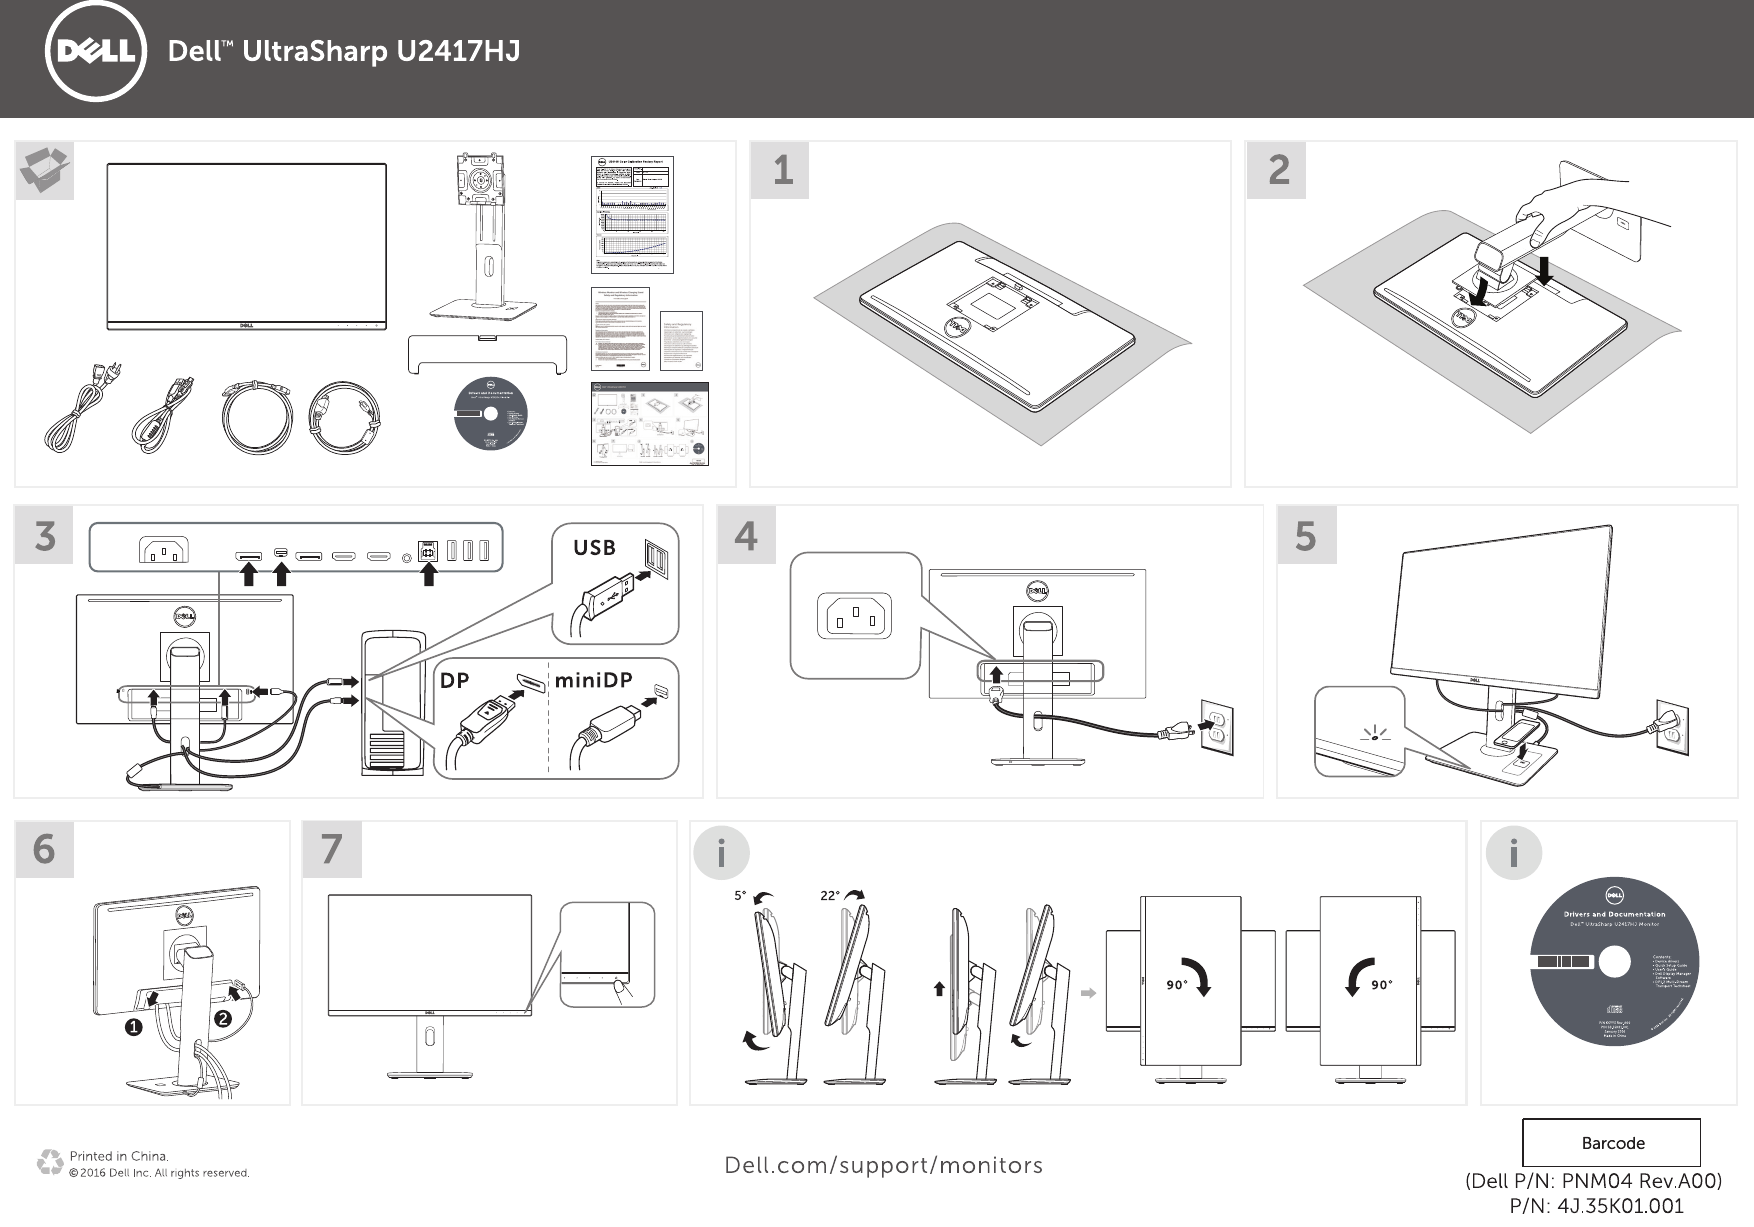 Dell u2417hj monitor クイックセットアップガイド User Manual その他の文書